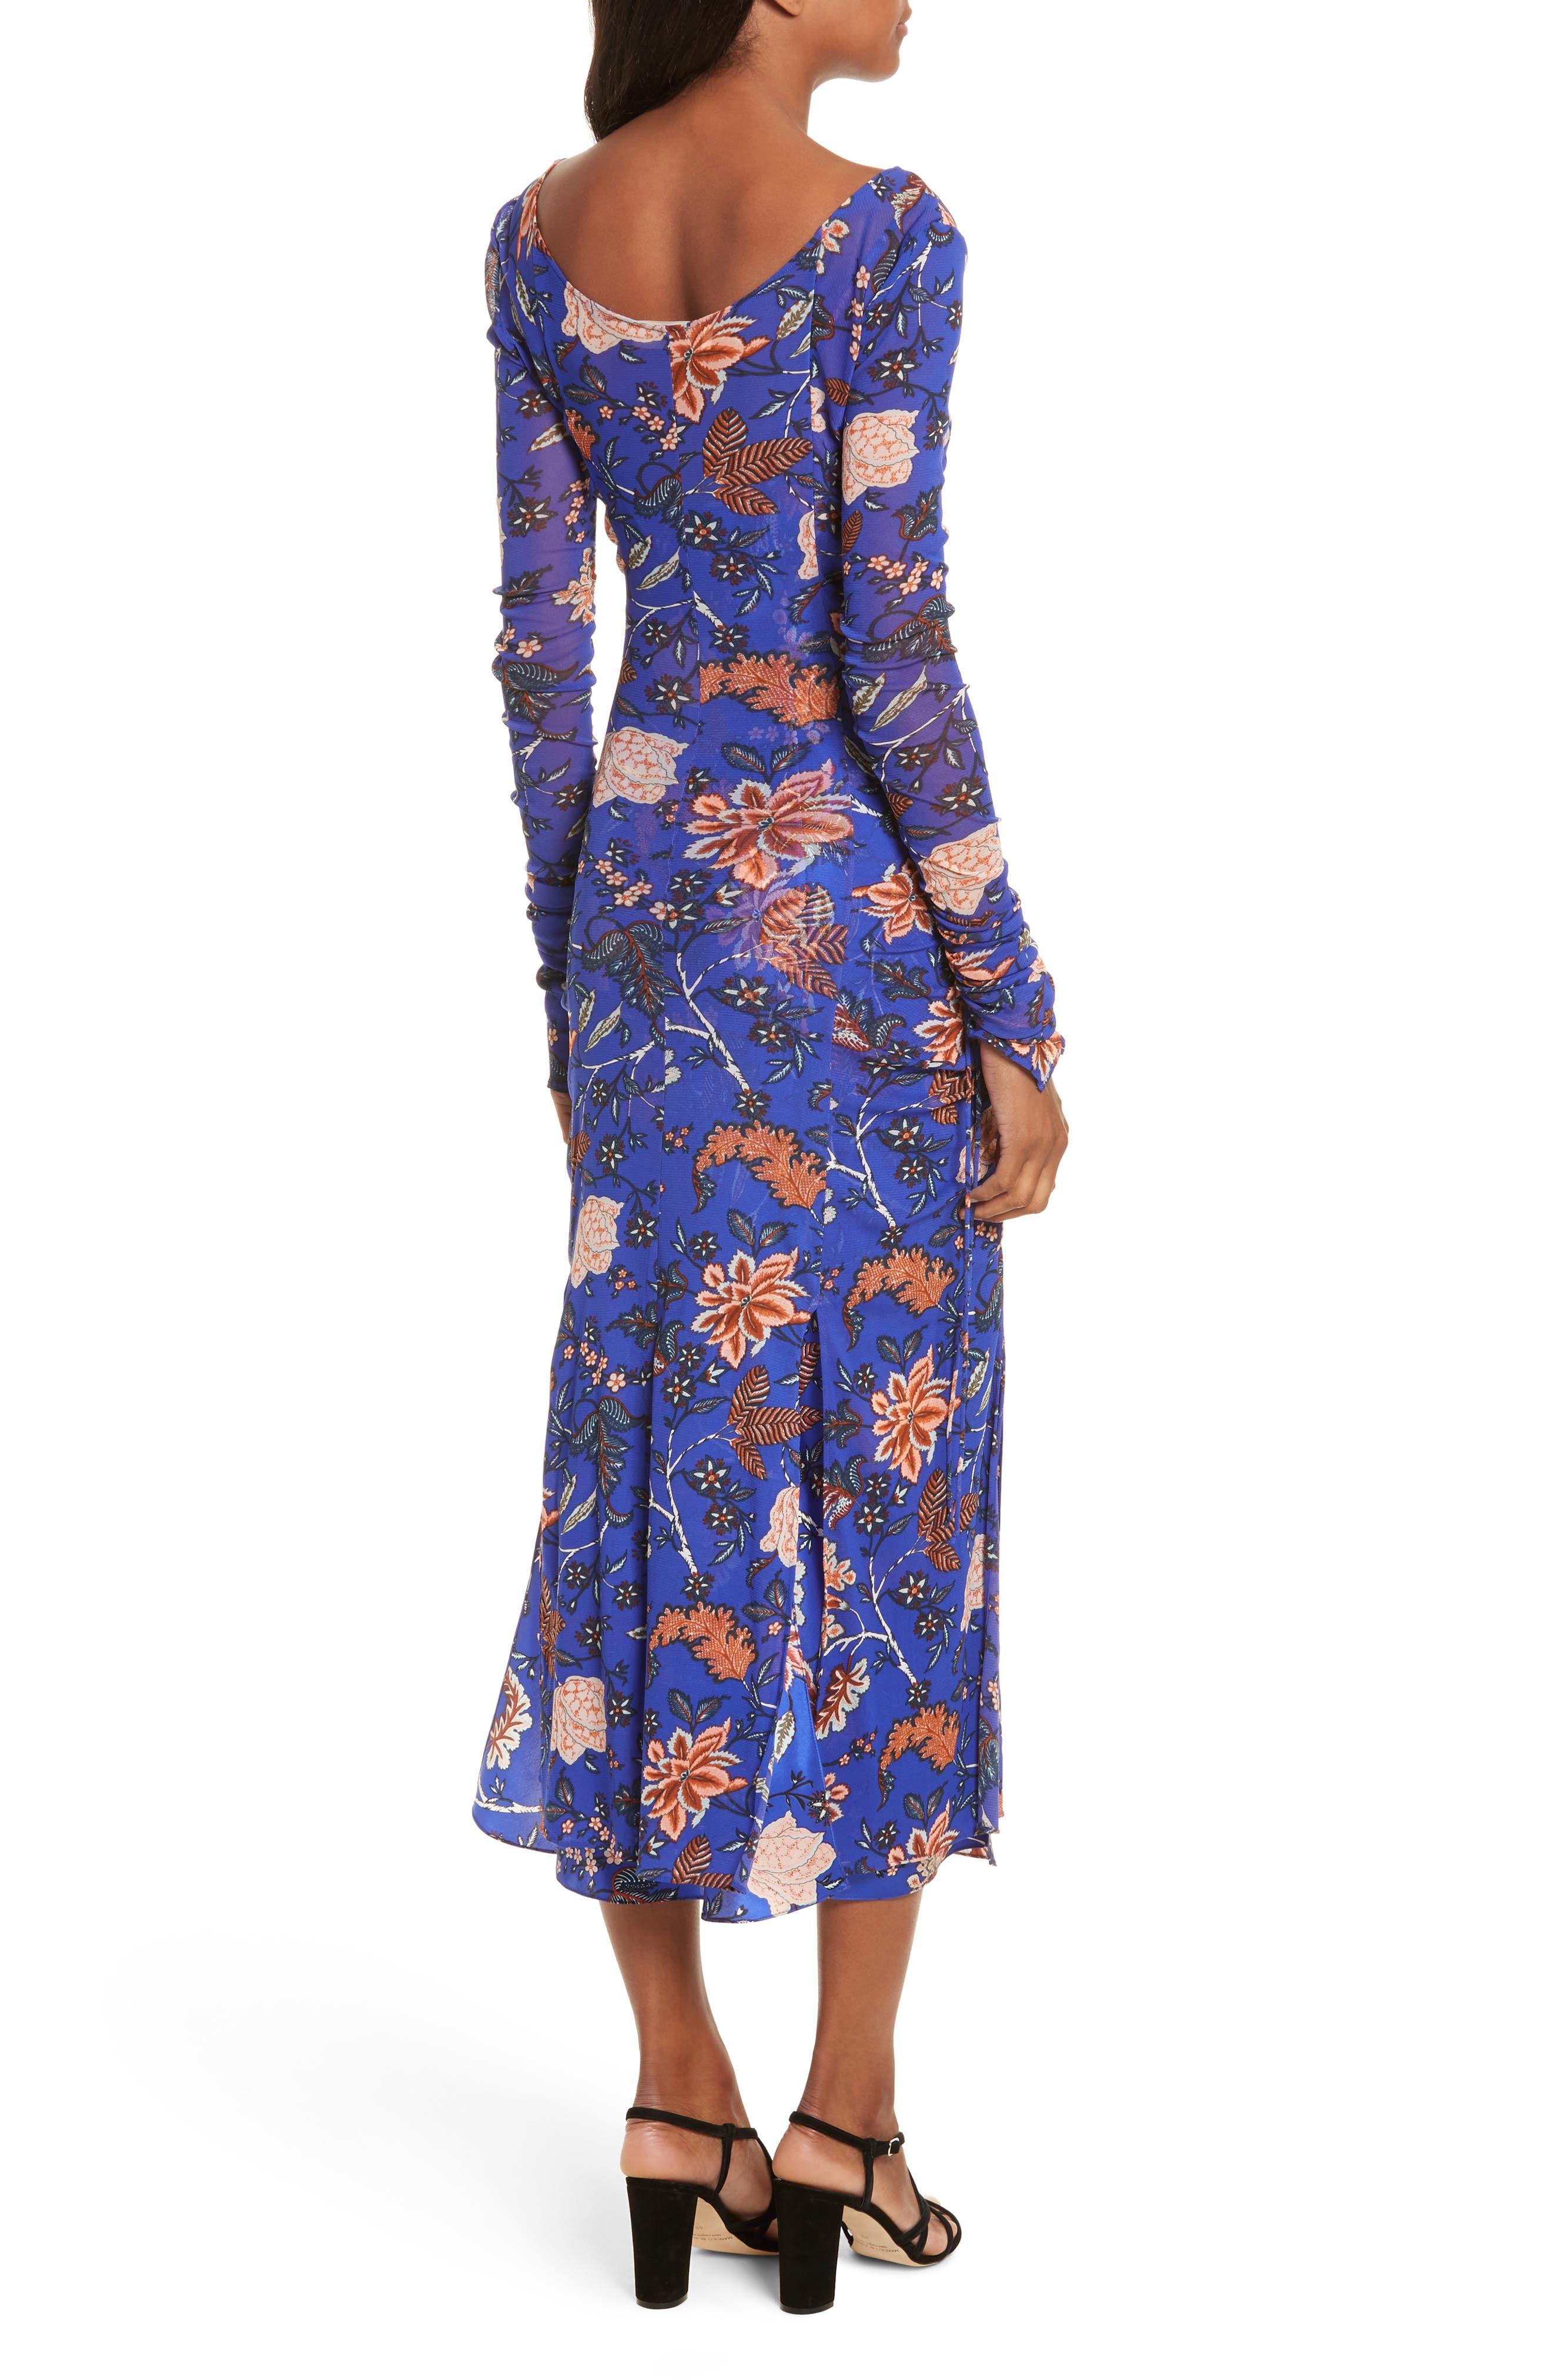 Diane von Furstenberg Mesh Overlay Floral Midi Dress,                             Alternate thumbnail 2, color,                             Canton Electric Blue